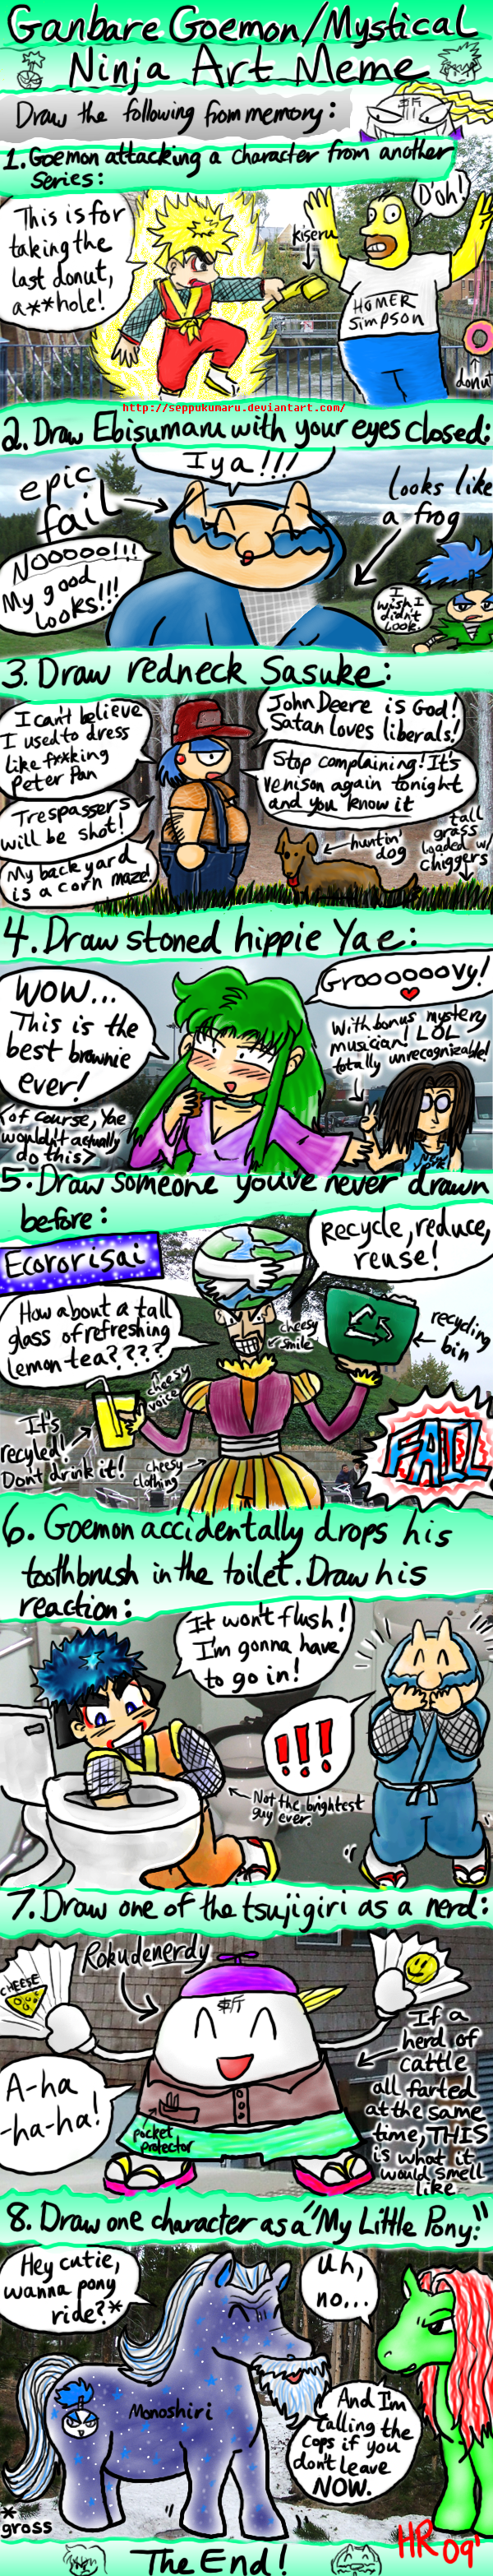 Ganbare Goemon meme- filled in by Seppukumaru